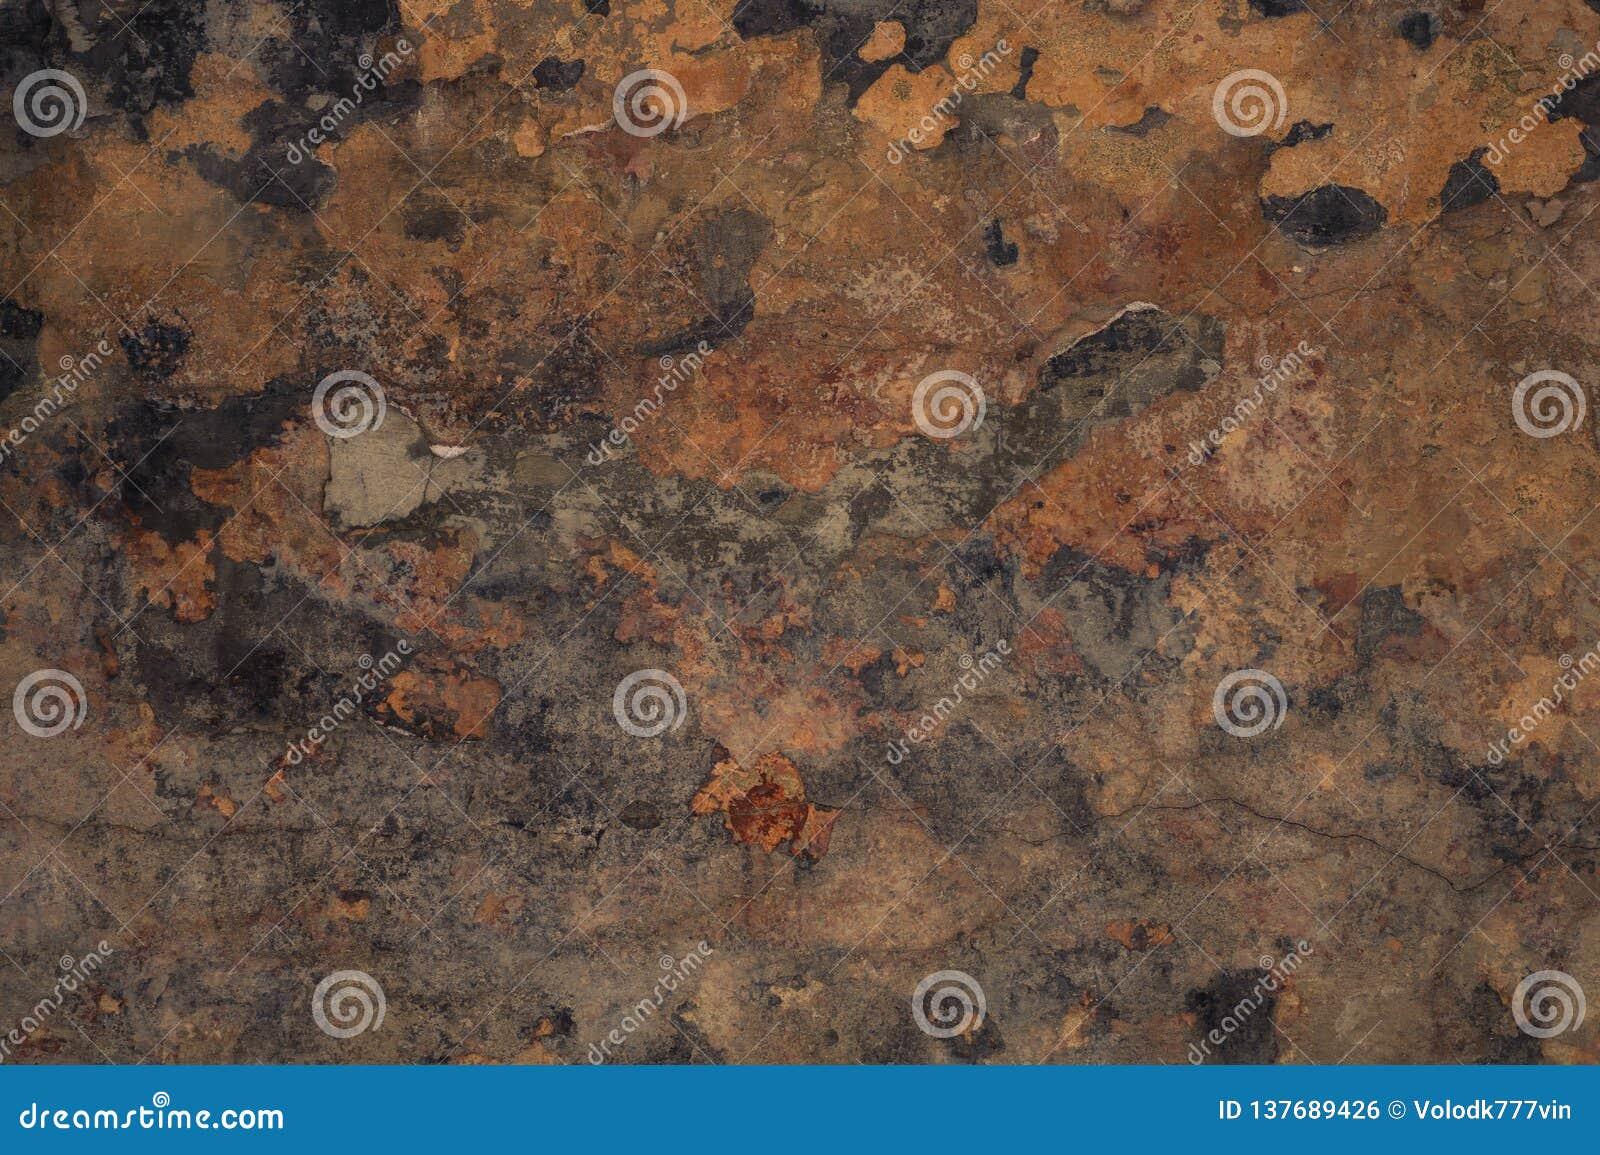 Fondo interesante pared marrón del fondo del grunge